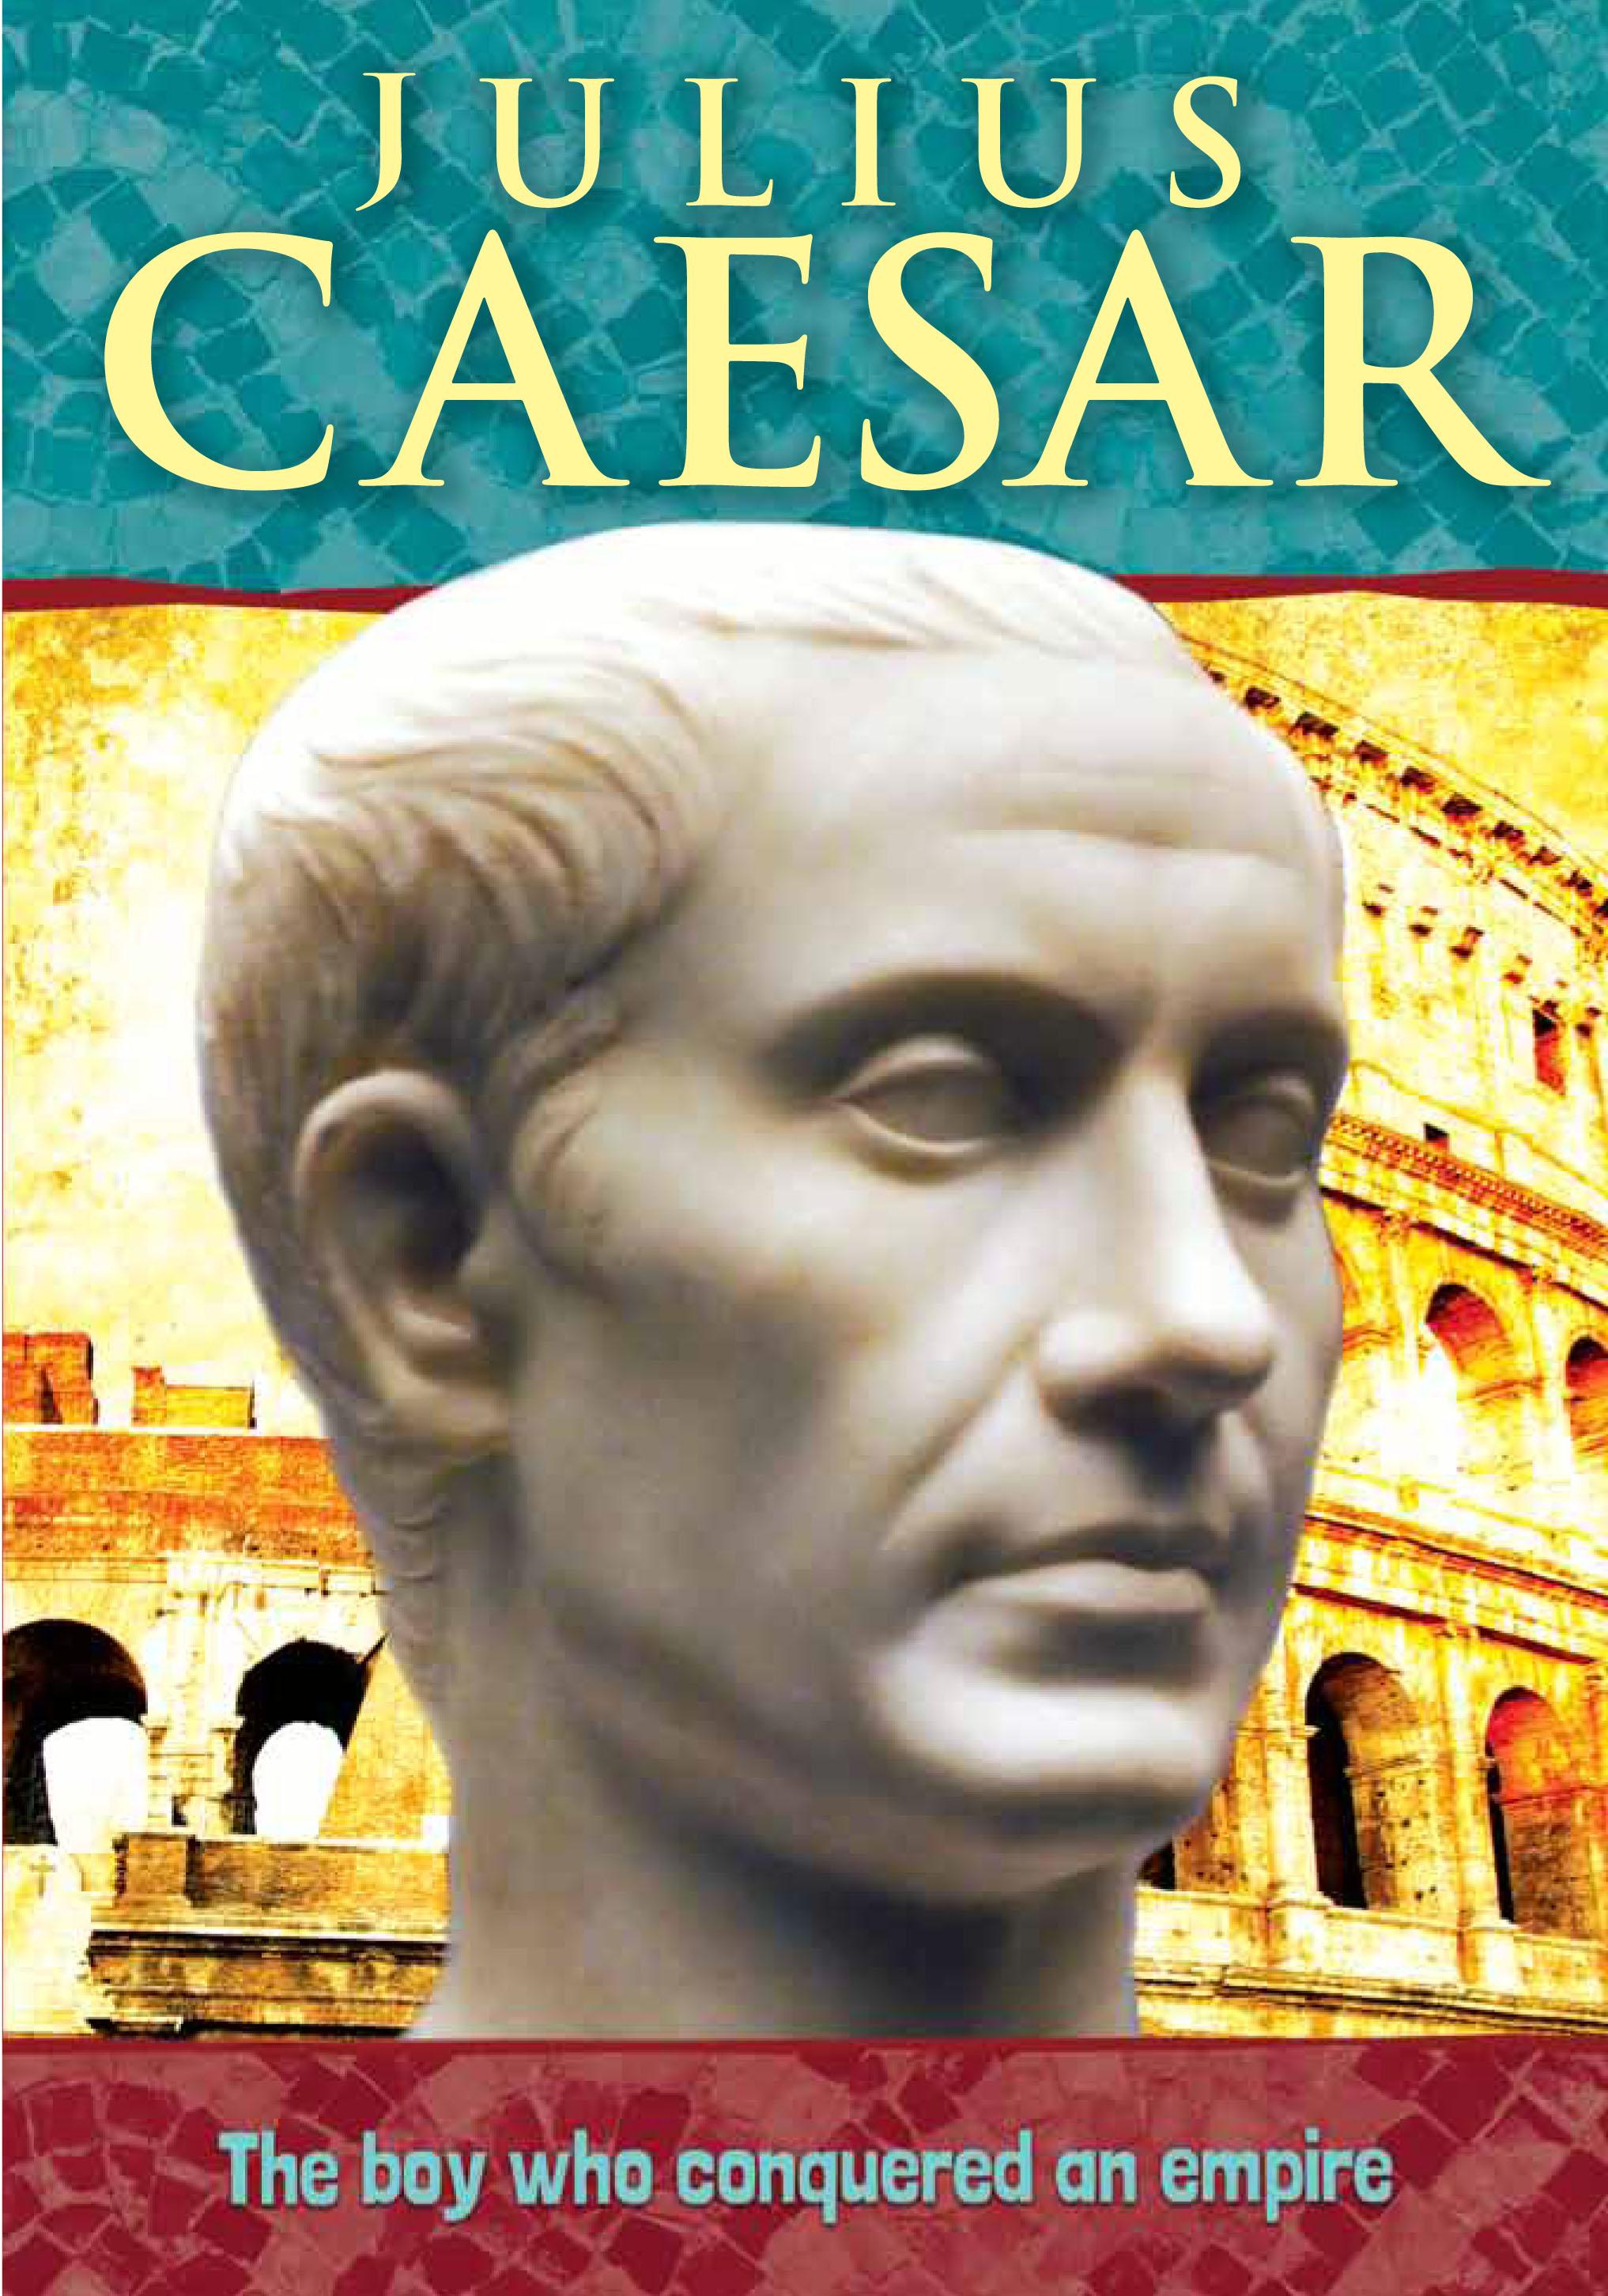 Biography Julius Caesar By Ellen Galford